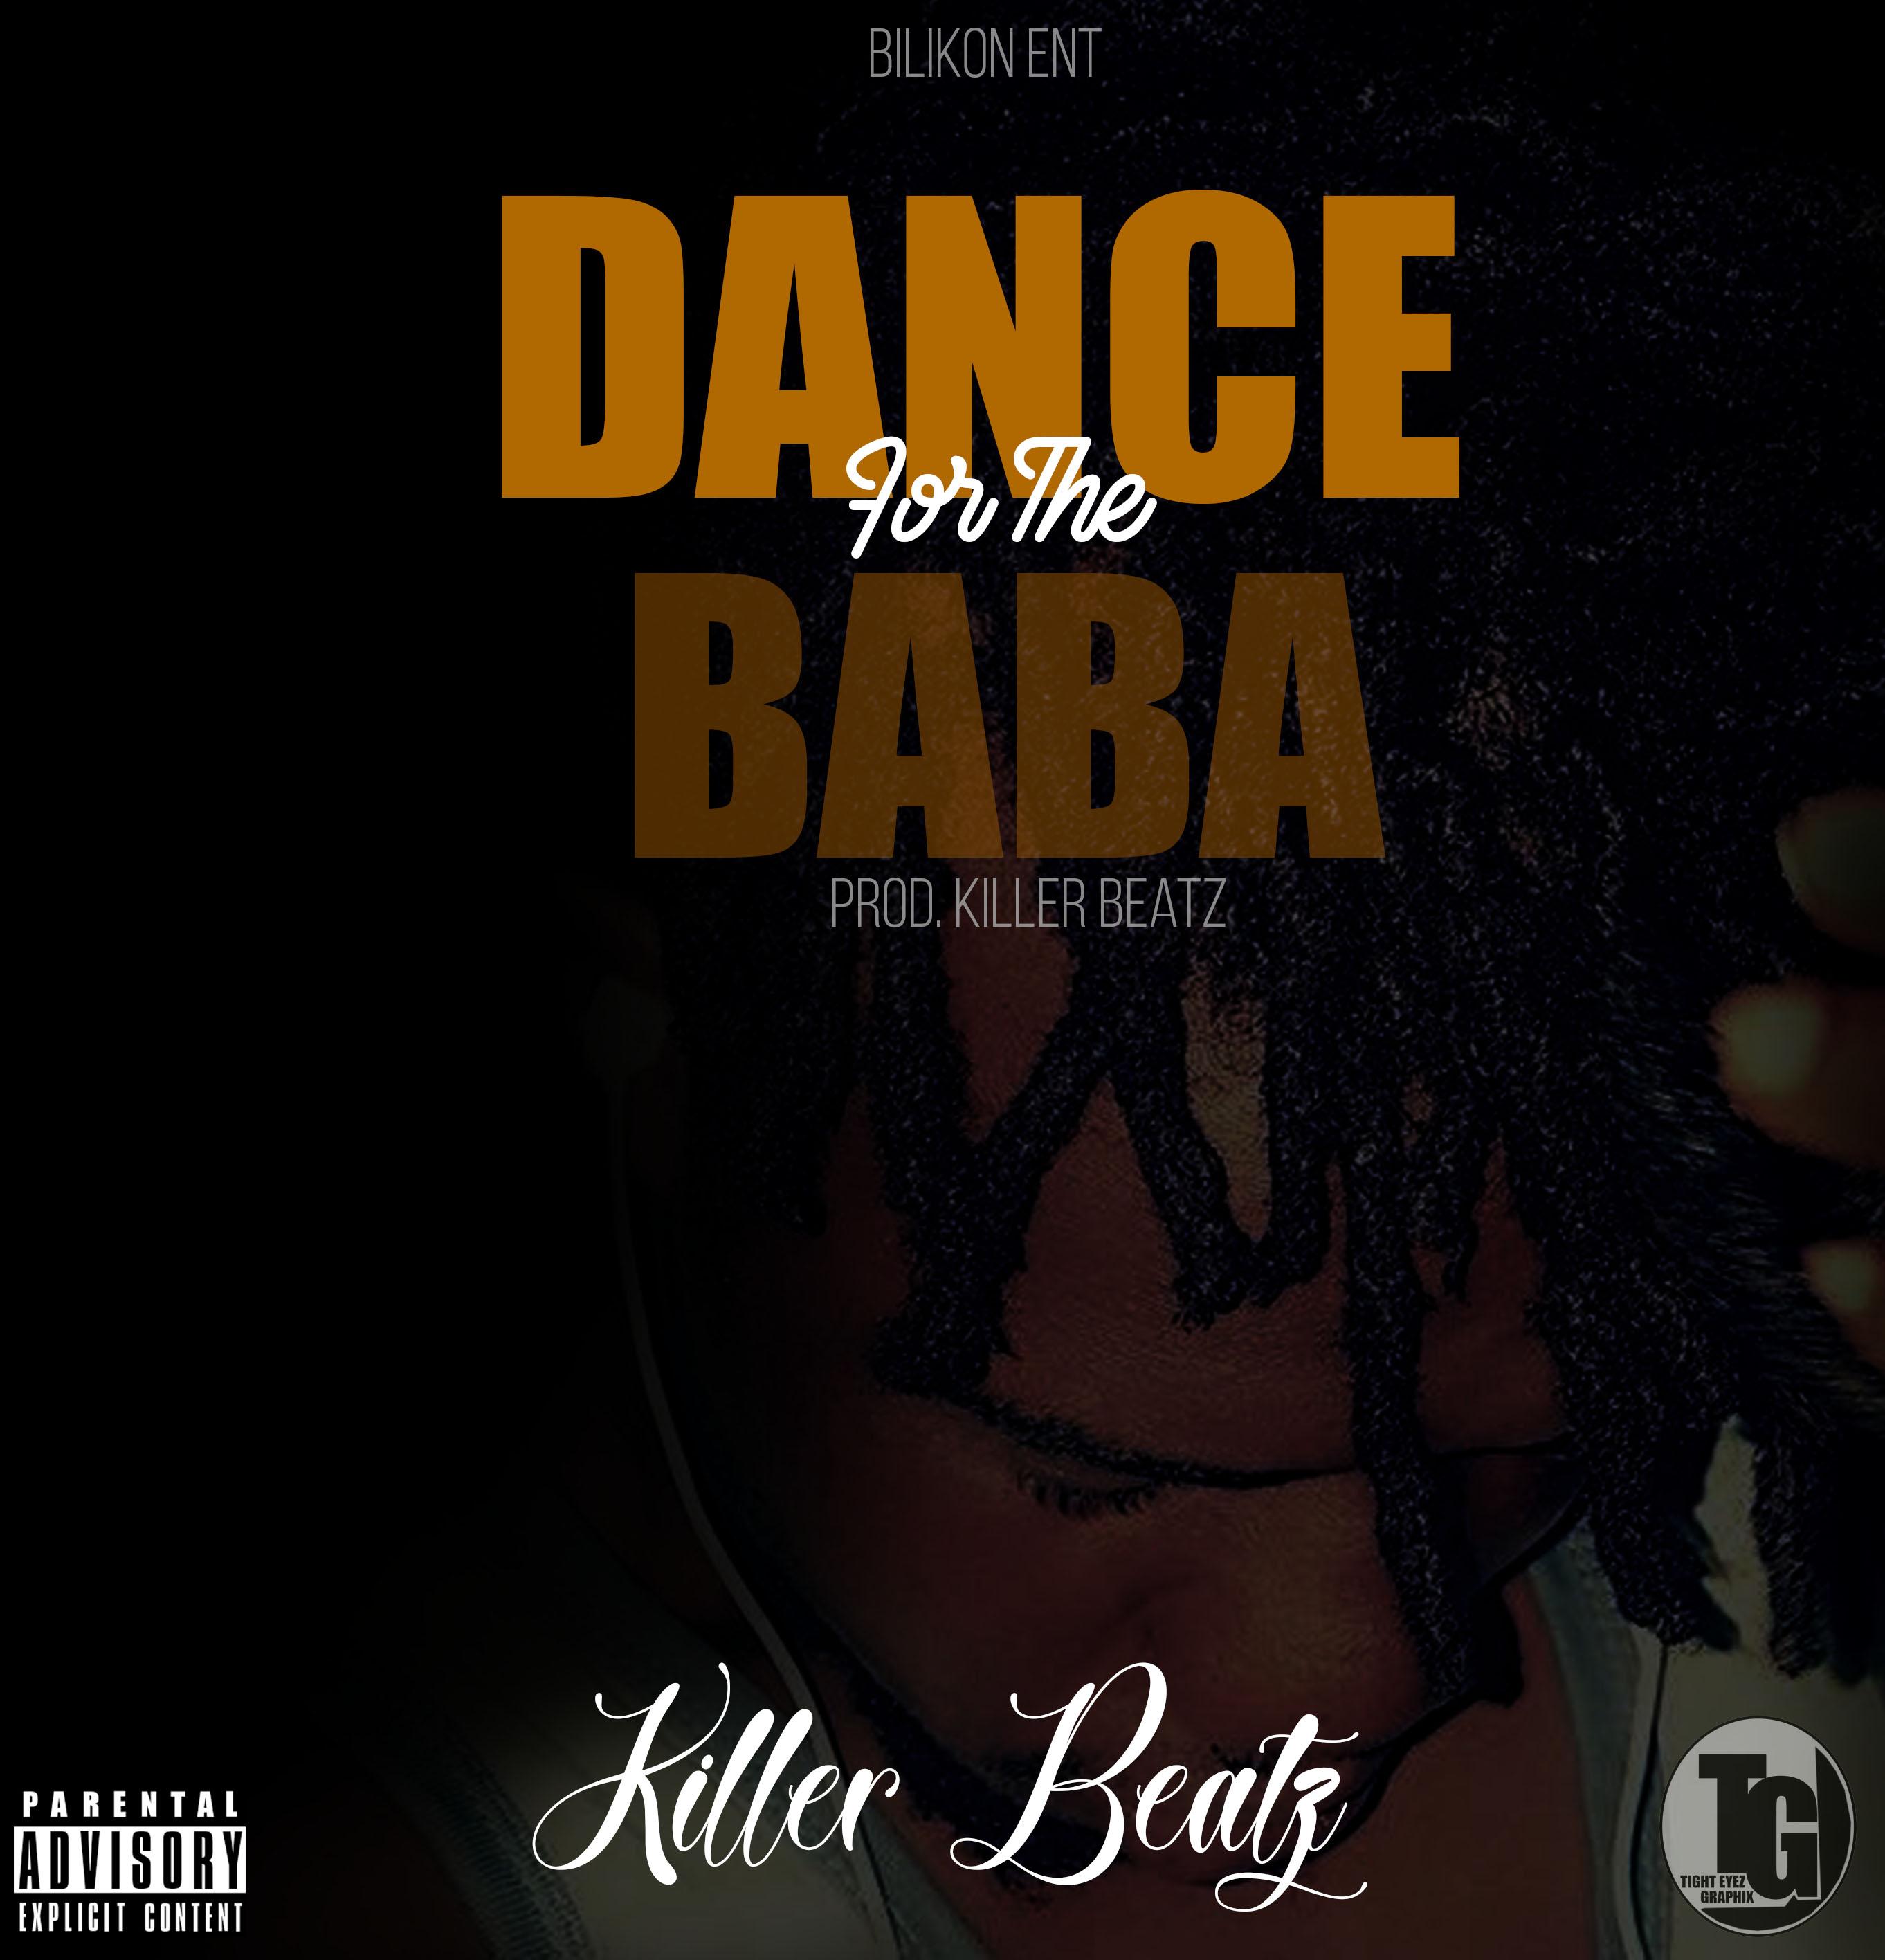 Killer-Beatz-Dance-For-The-Baba-Prod.-Killer-Beatz.jpg